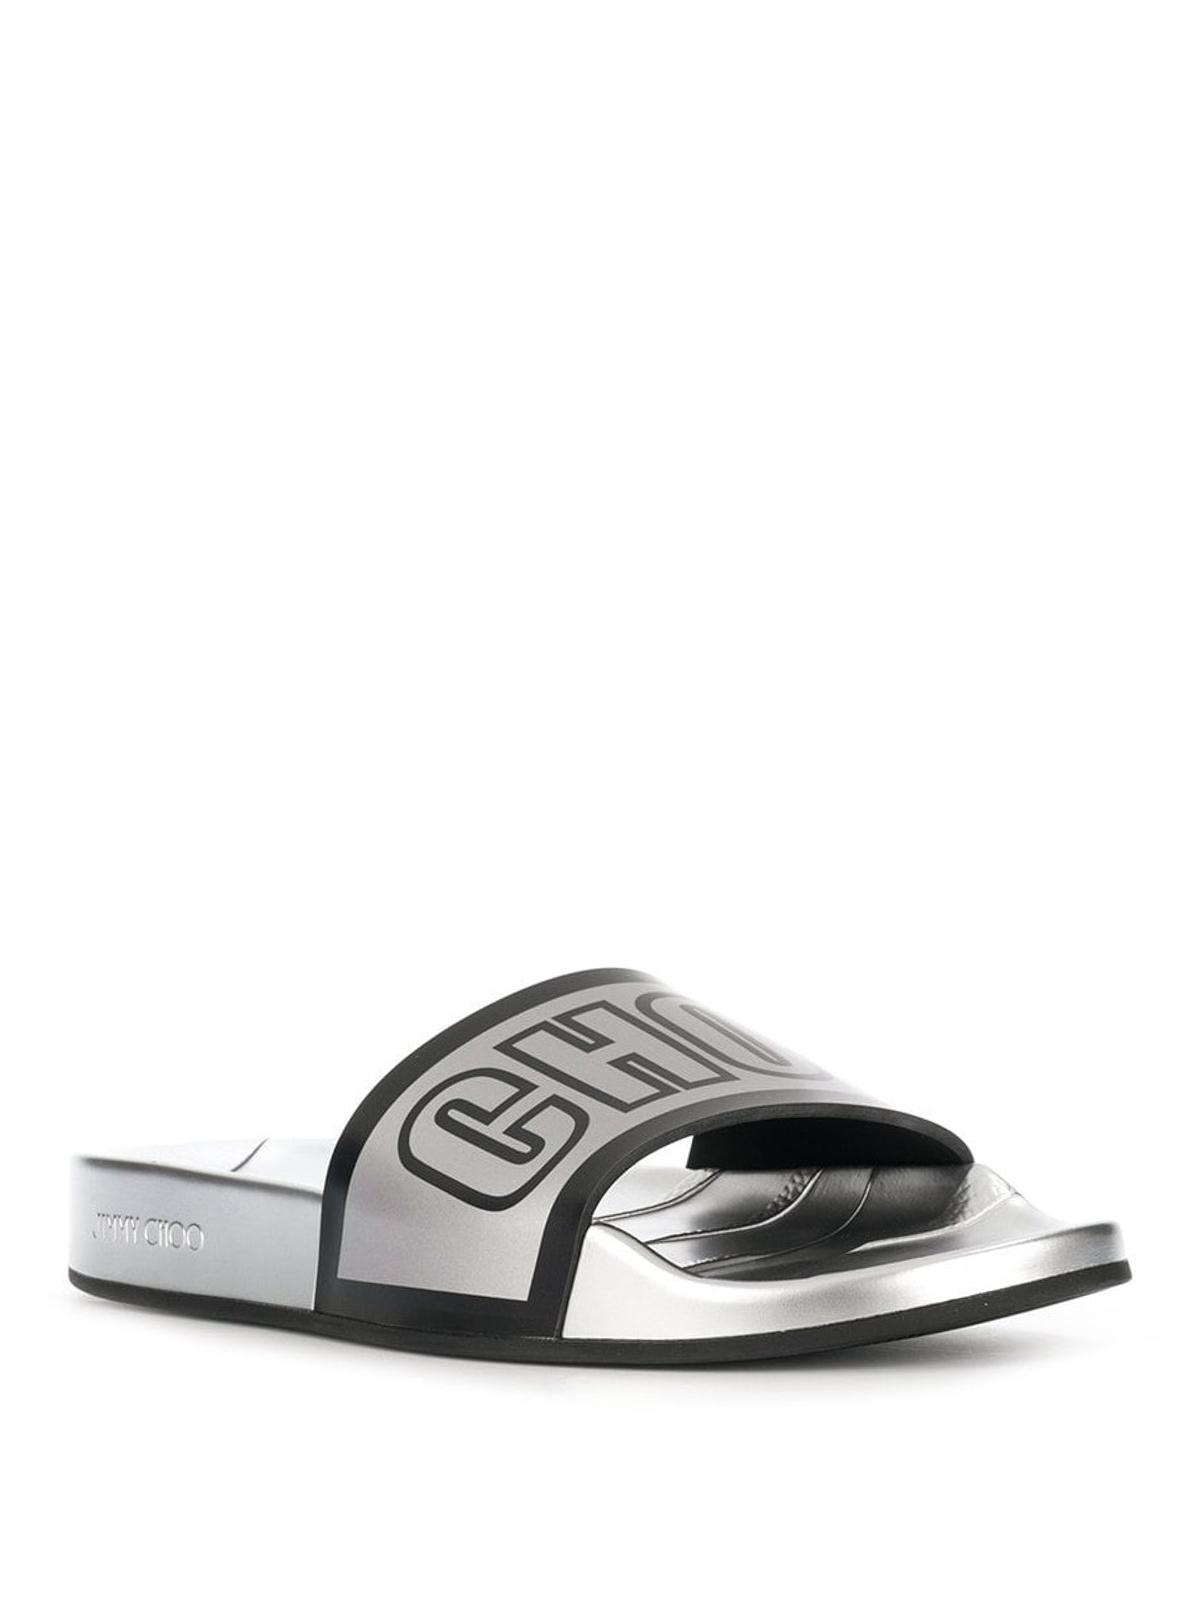 961f7ecadb2 JIMMY CHOO: sandals online - Rey/F logo metallic silver rubber slides